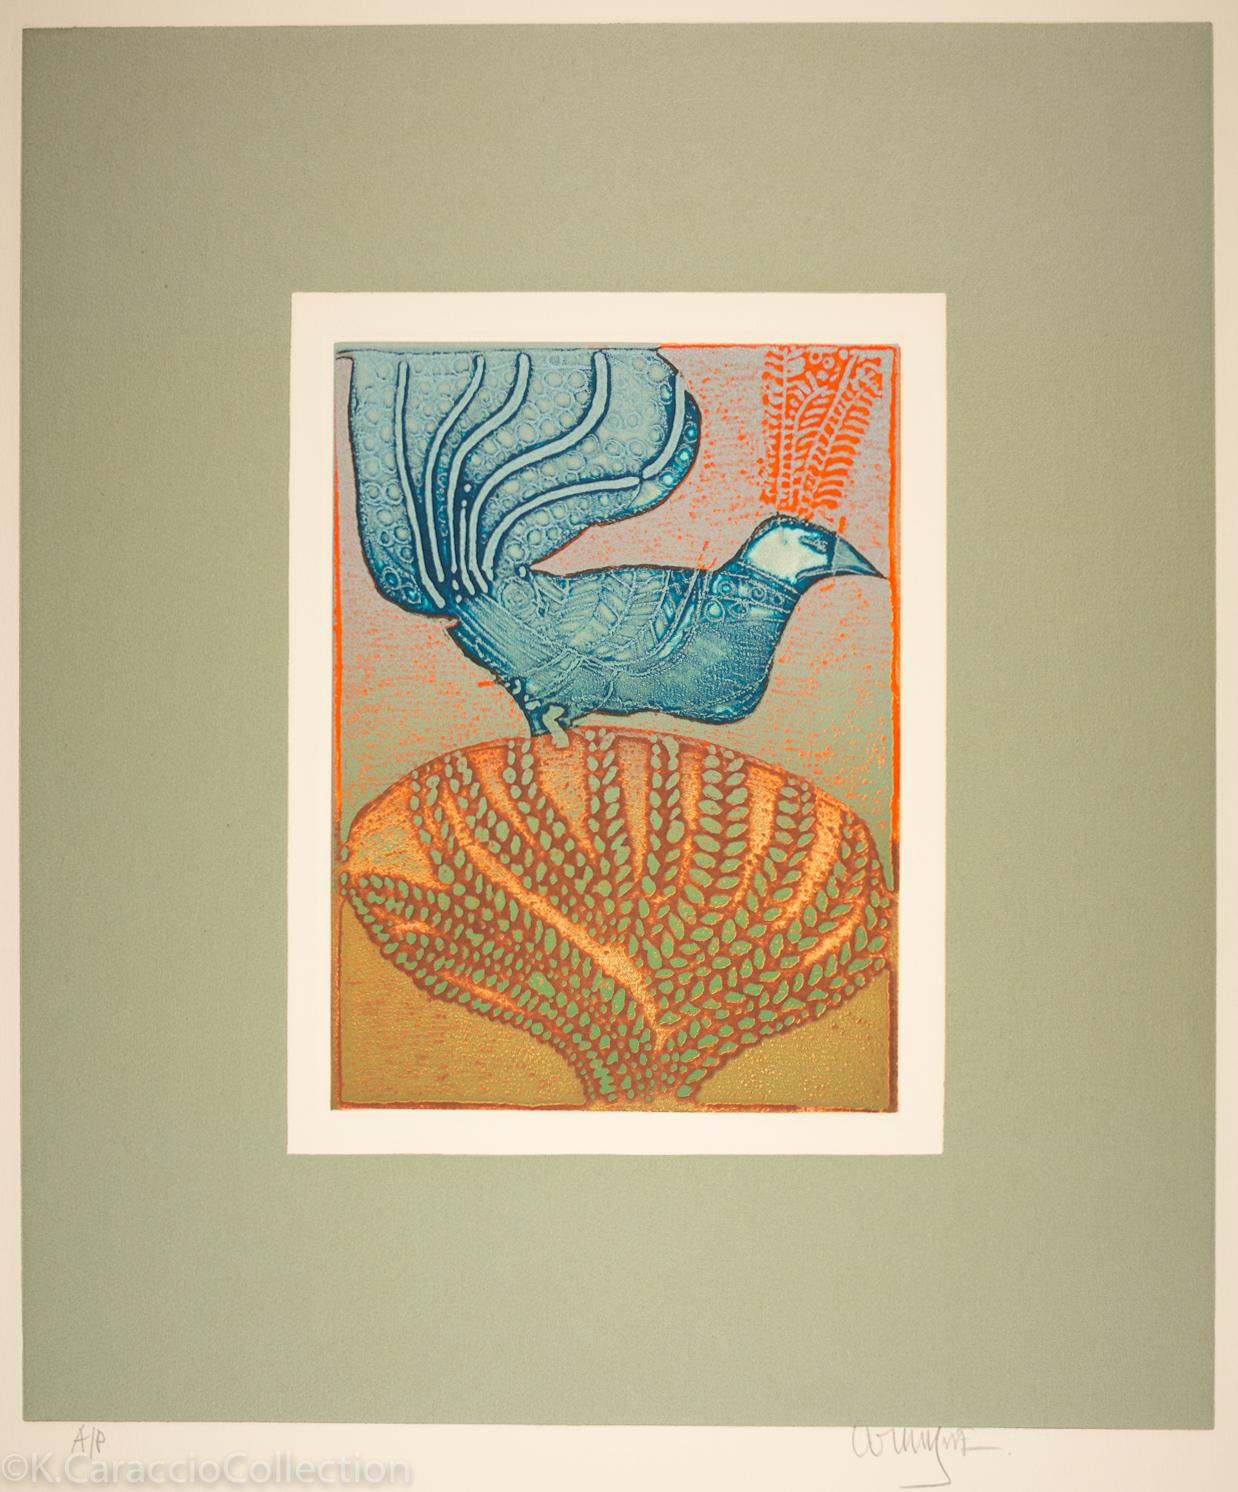 Peacock, 1978